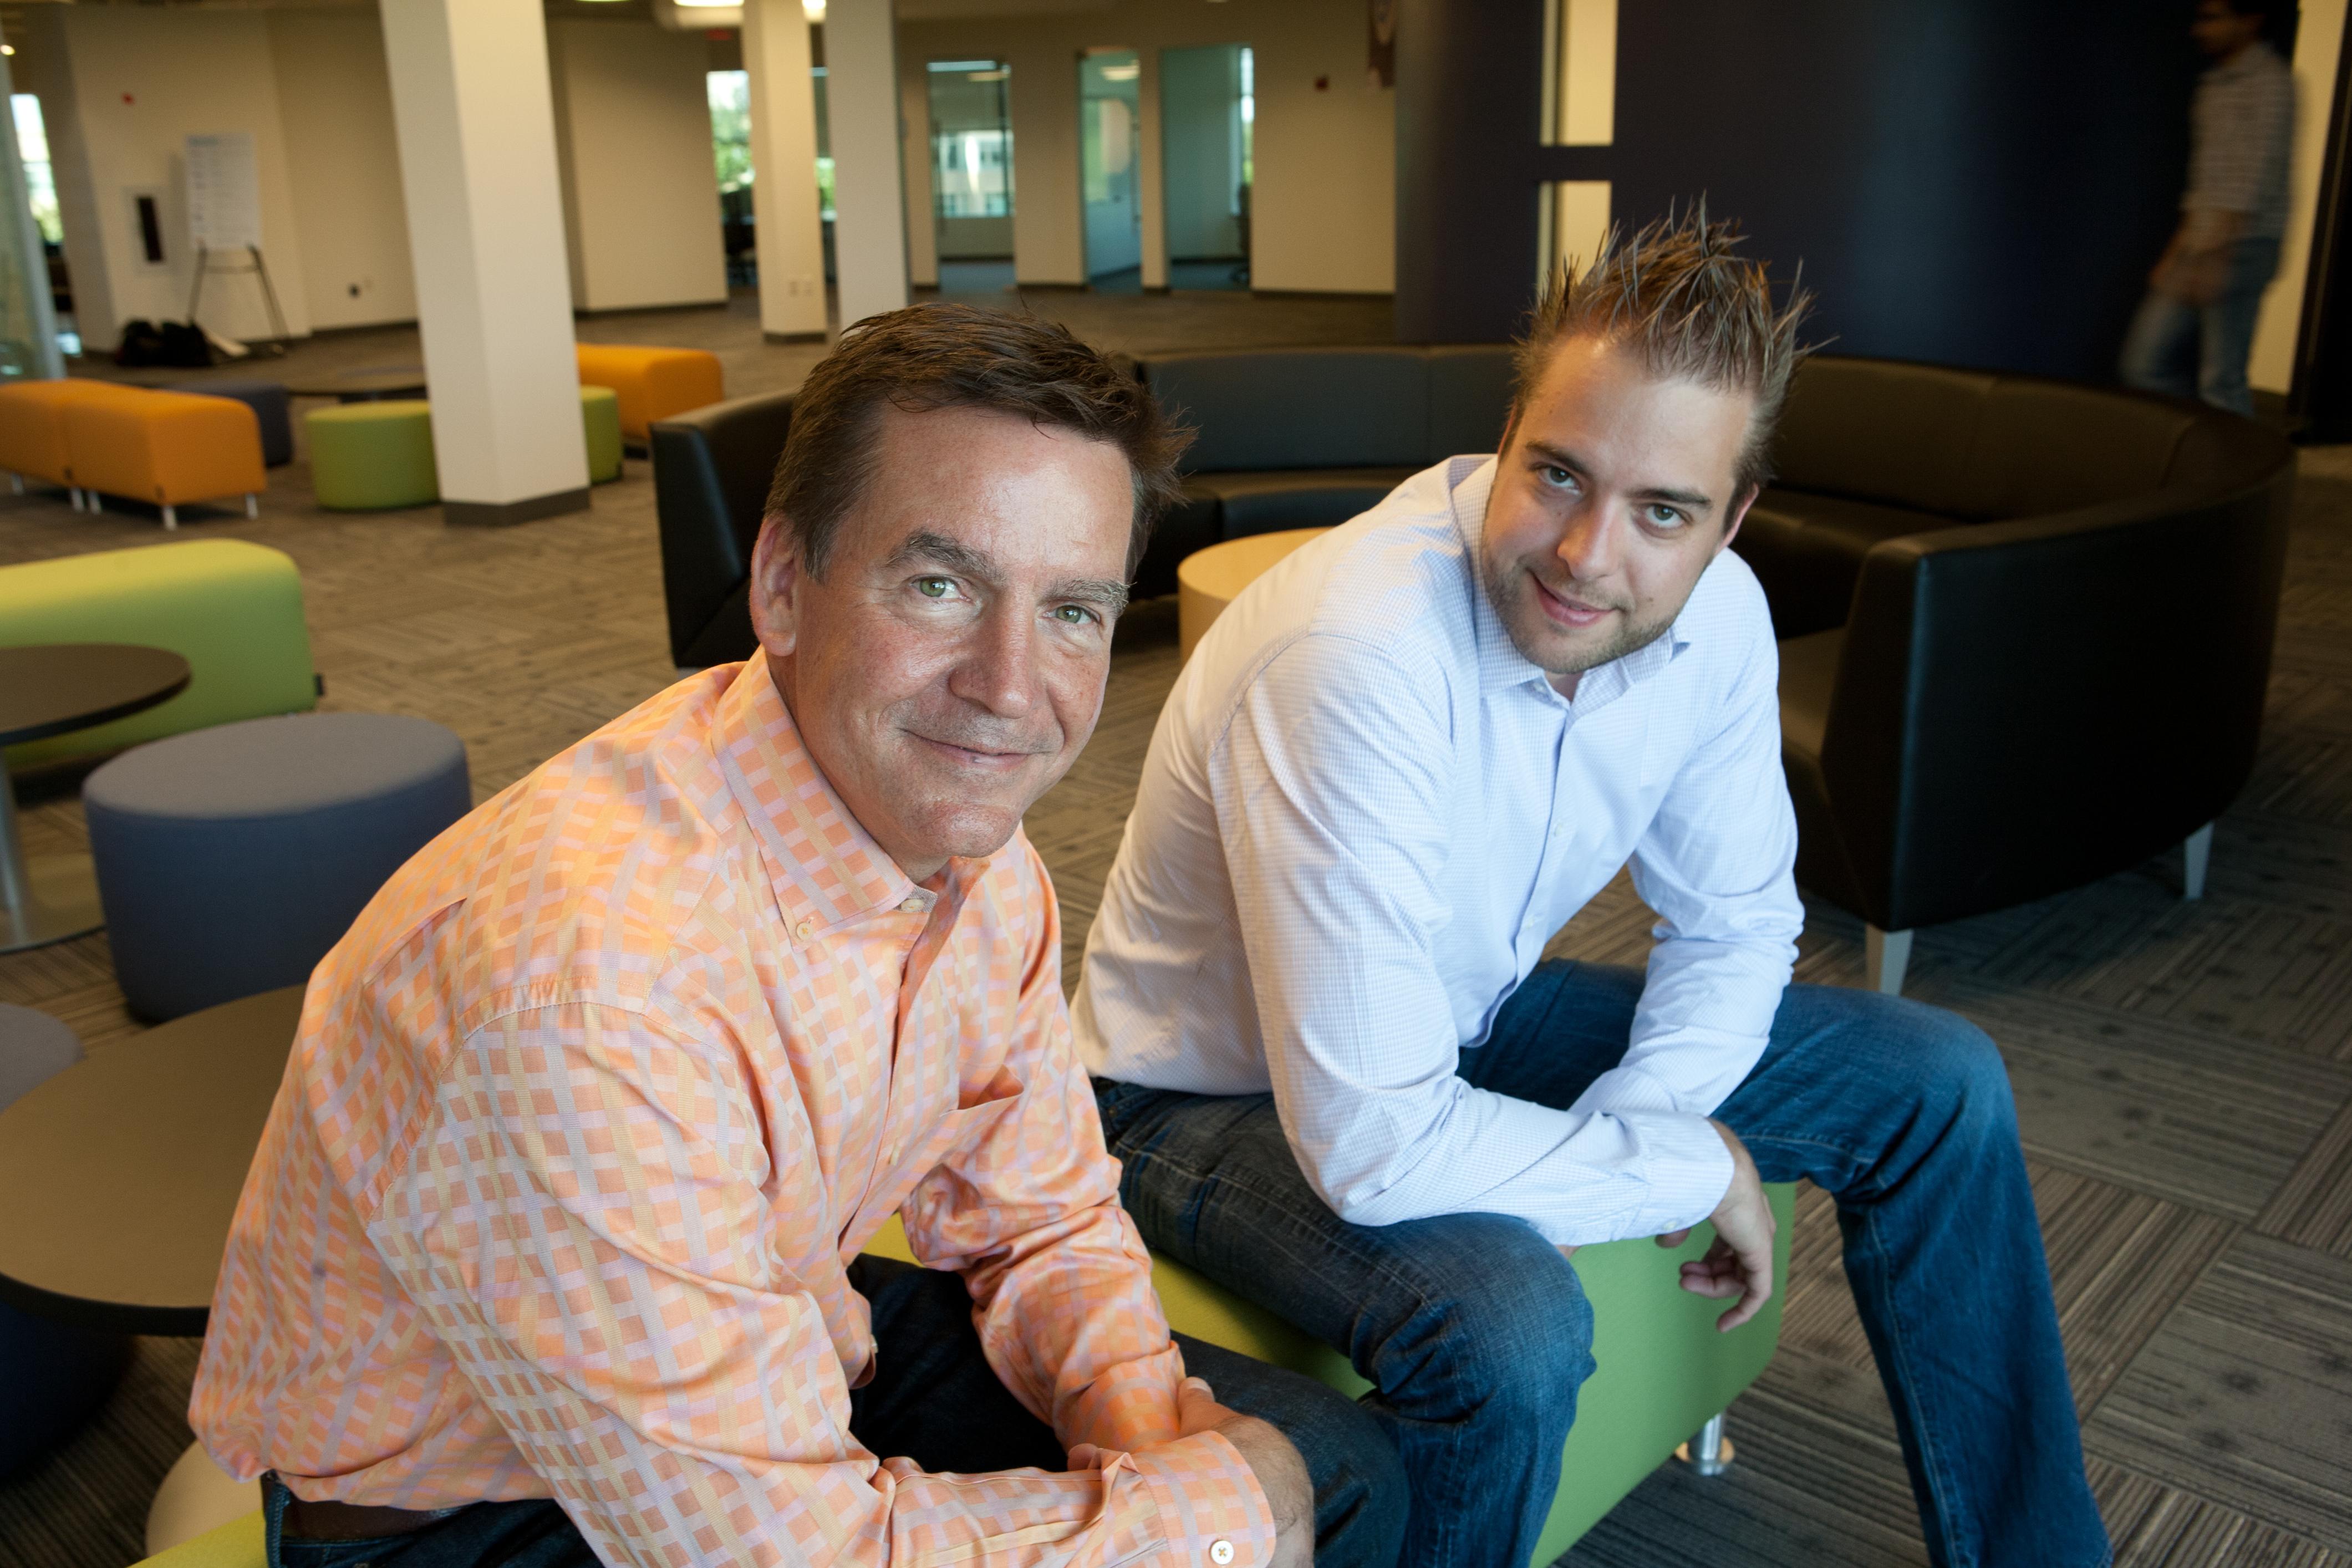 Acquia CEO Tom Erickson and CTO Dries Buytaert